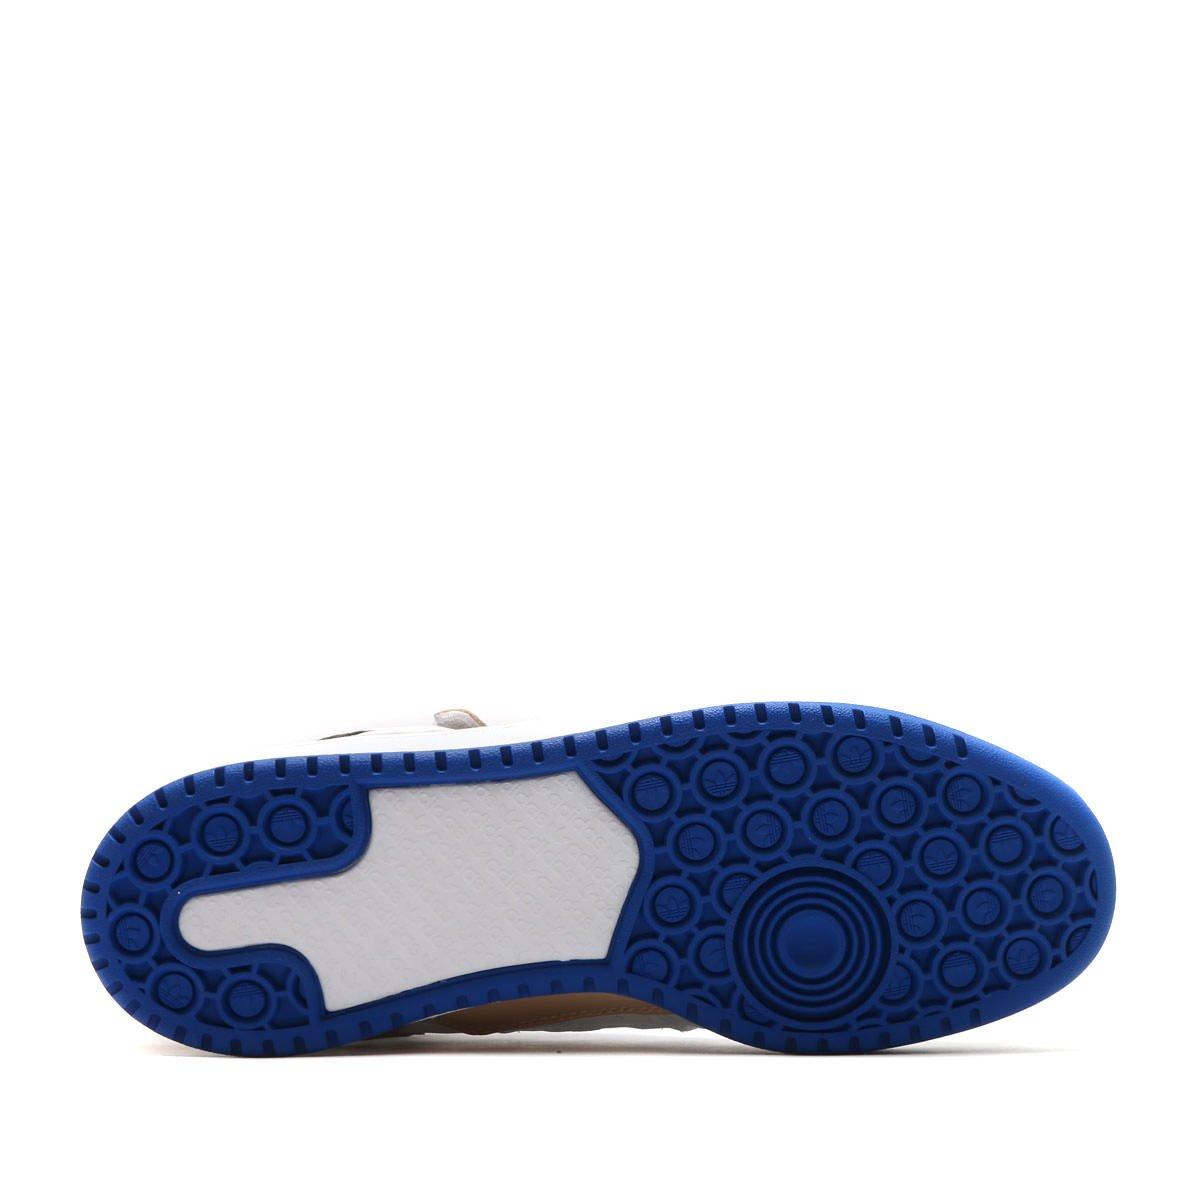 new product 5da59 3da74 Amazon.com  adidas Mens Forum MID Athletic  Sneakers  Fashion Sneakers